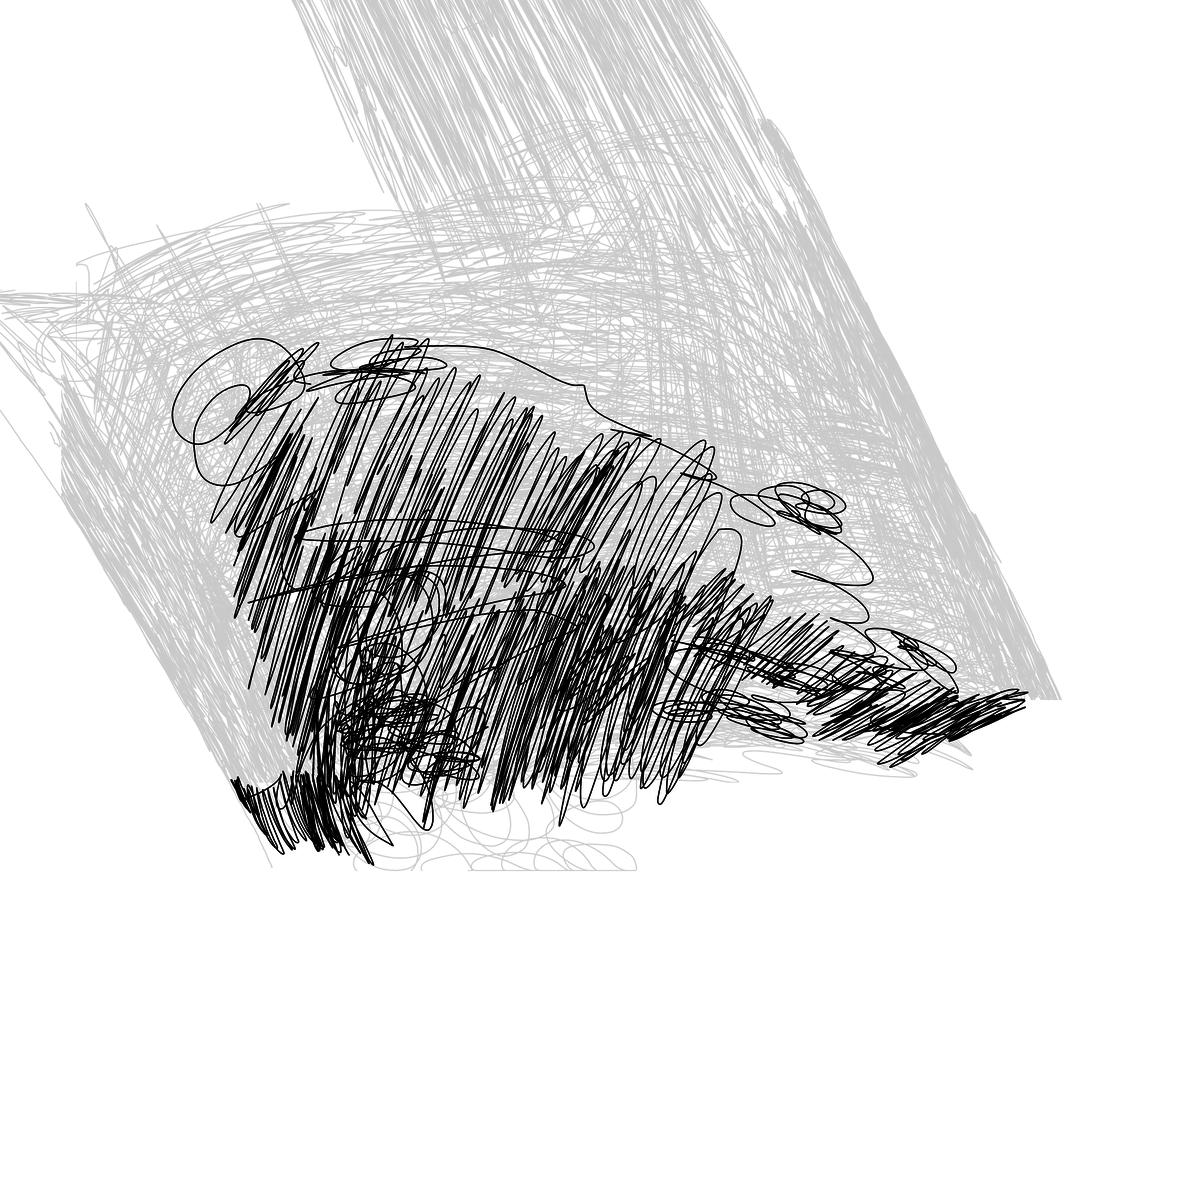 BAAAM drawing#6176 lat:52.4879646301269500lng: 13.4253482818603520